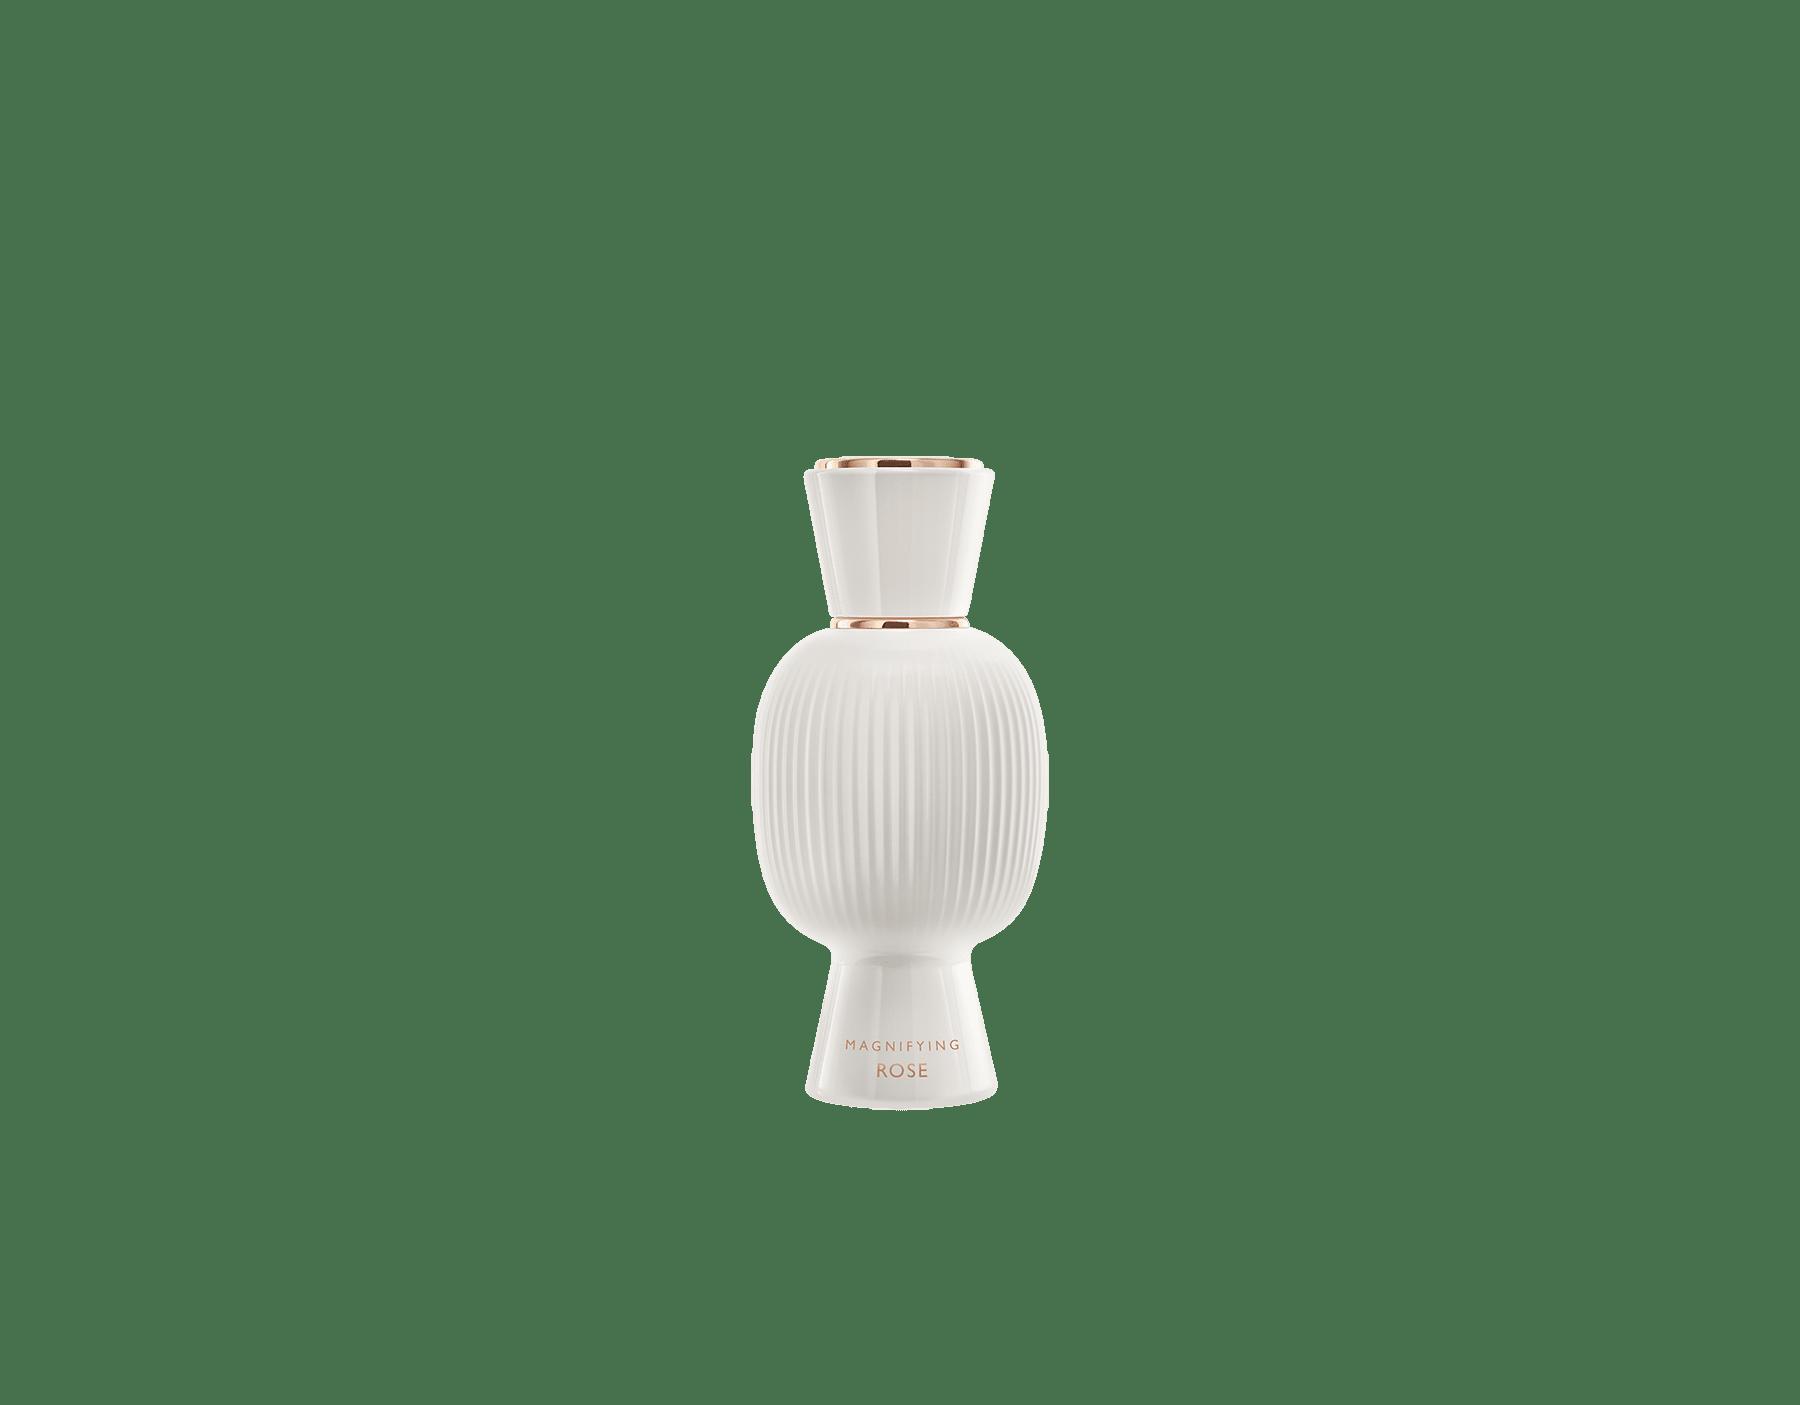 獨特香水套組,和您一樣大膽特別。歡欣喜悅的柑苔調 Fantasia Veneta Allegra 淡香精融合感性濃郁的 Magnifying Rose 玫瑰精華,創造出個性鮮明的女香。 Perfume-Set-Fantasia-Veneta-Eau-de-Parfum-and-Rose-Magnifying image 3